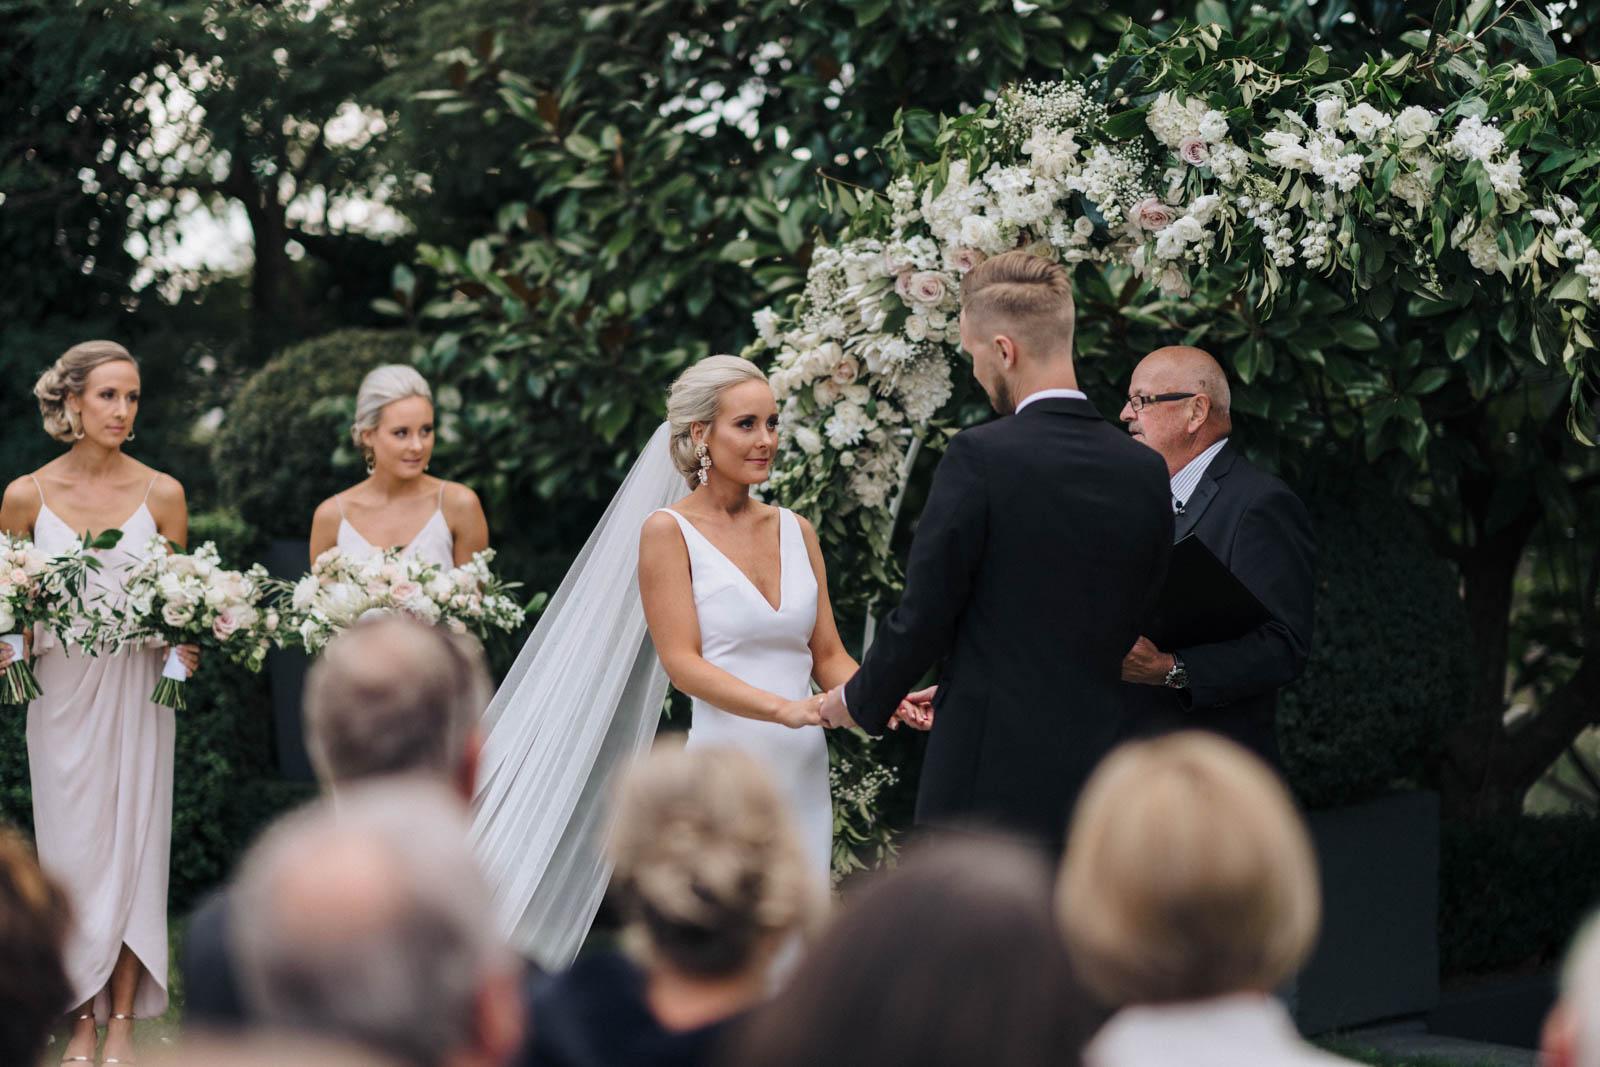 newfound-k-s-hilton-taupo-wedding-photographer-032